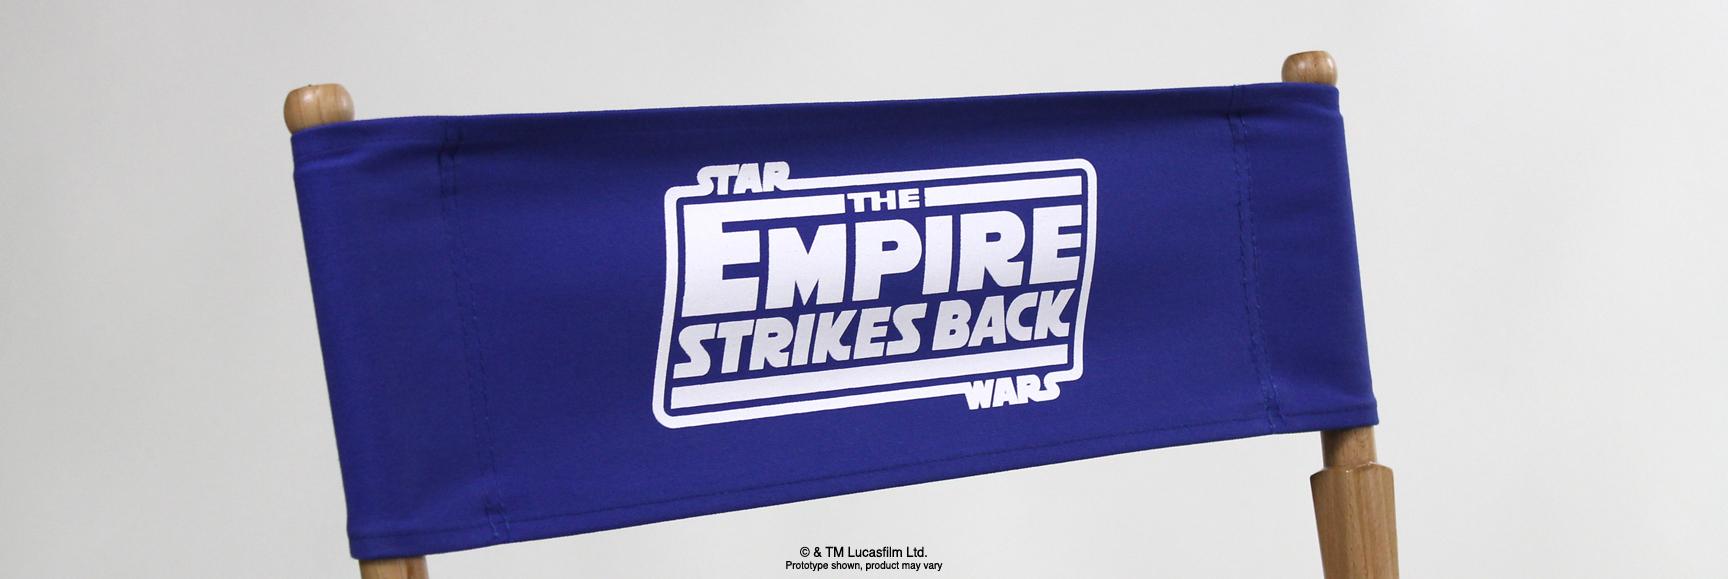 Star wars ESB director chair